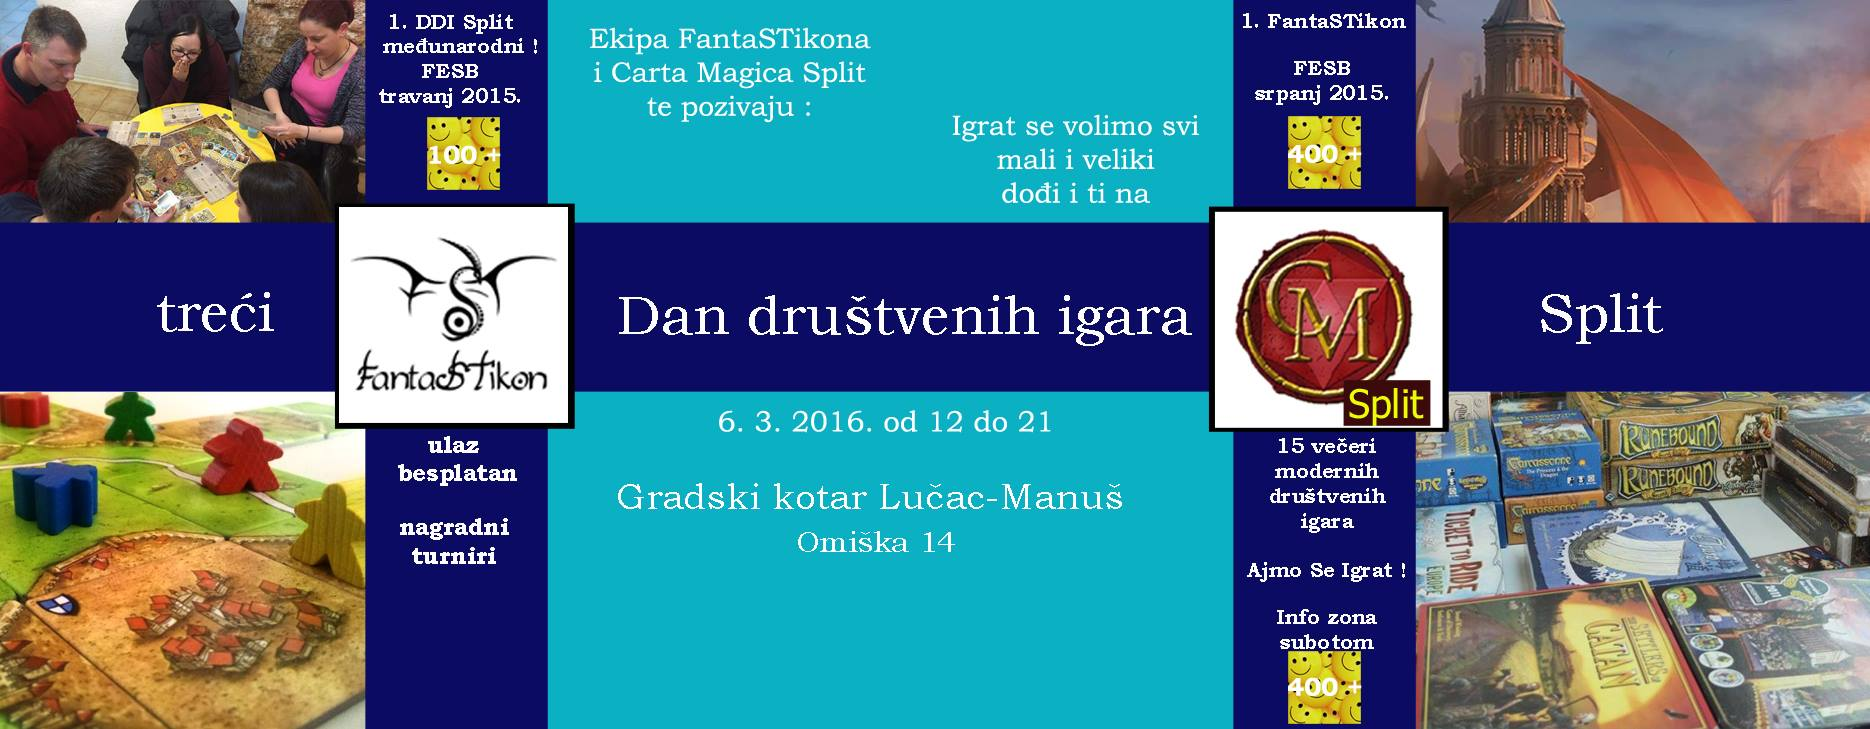 3. Dan društvenih igara u Splitu